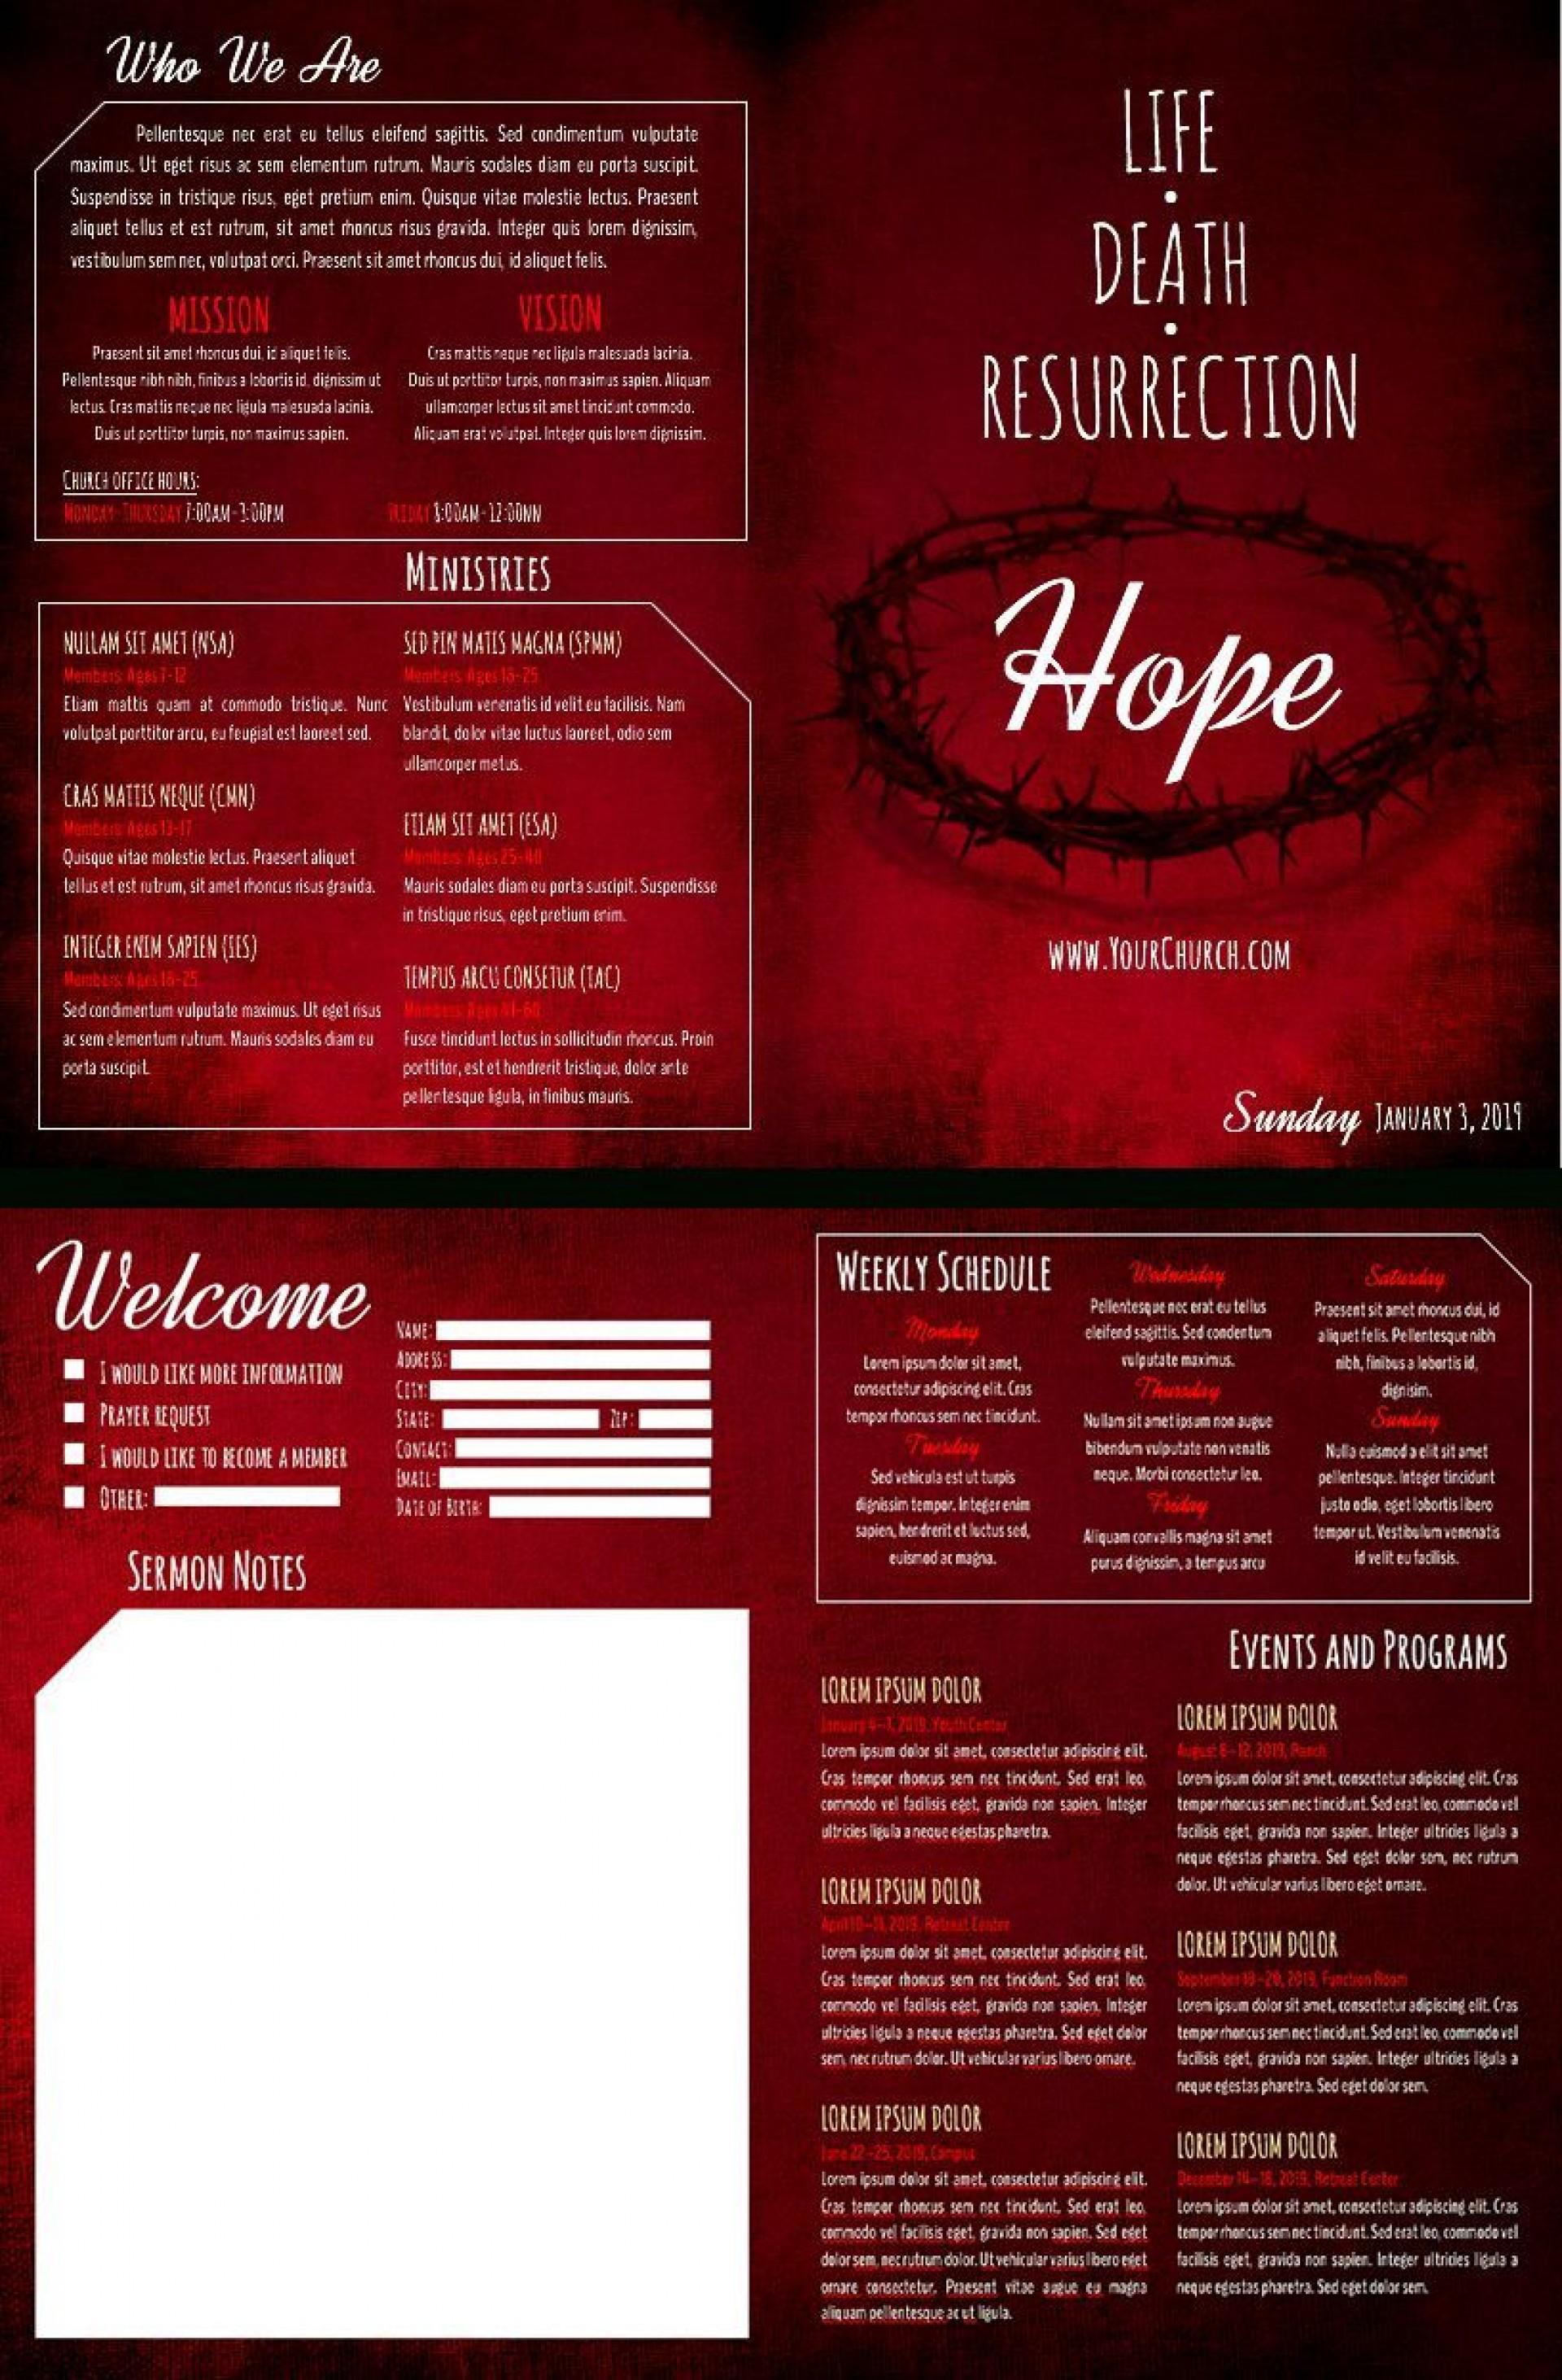 006 Magnificent Free Church Program Template Microsoft Publisher High Def 1920